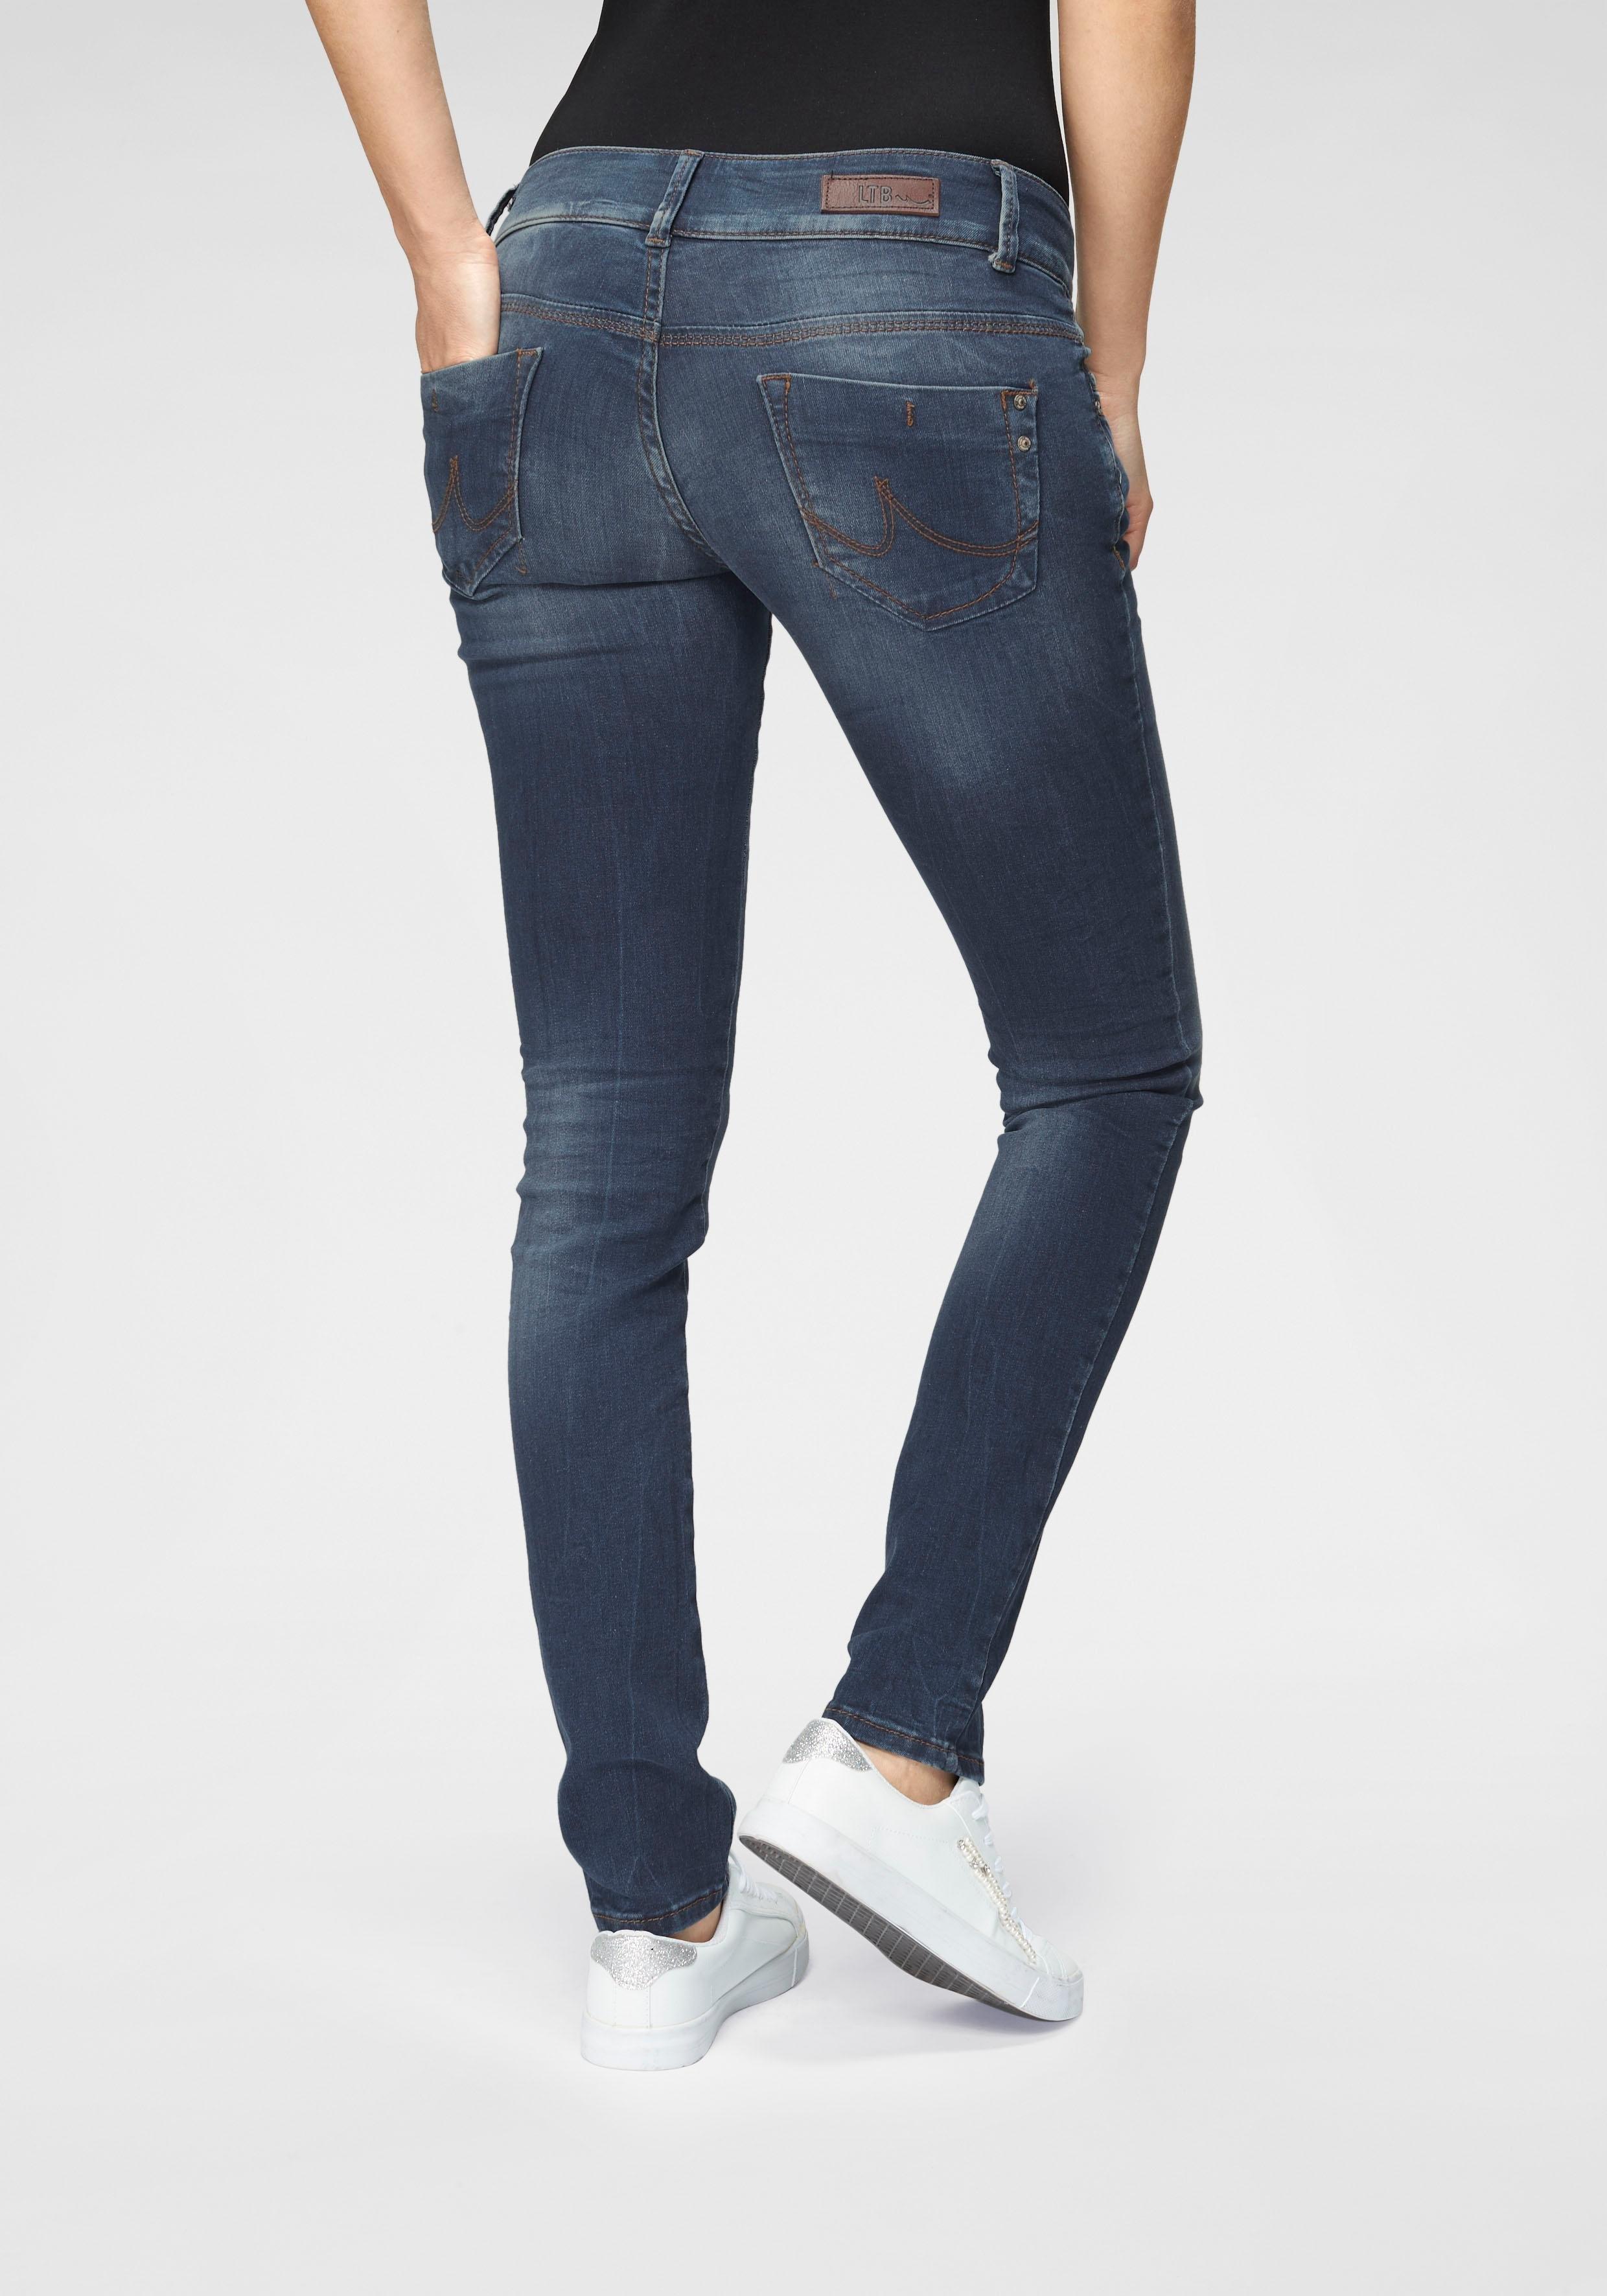 LTB slim fit jeans »MOLLY« bestellen: 30 dagen bedenktijd